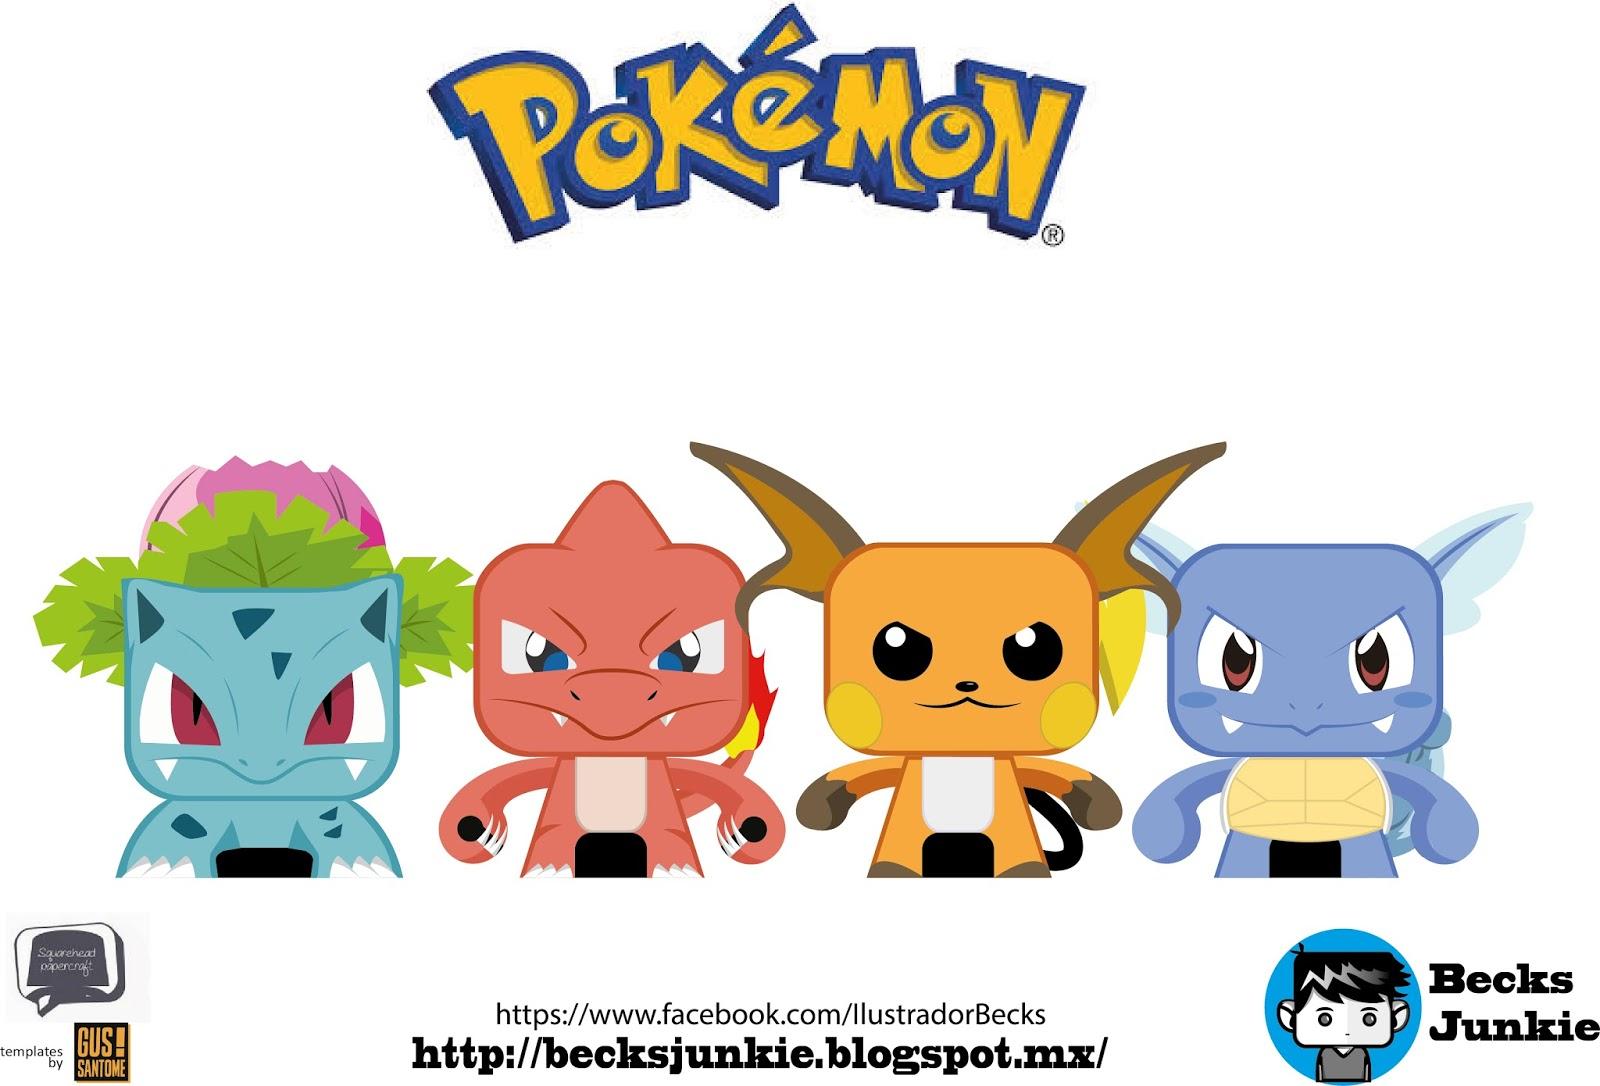 Becks Junkie: Pokémon - photo#38